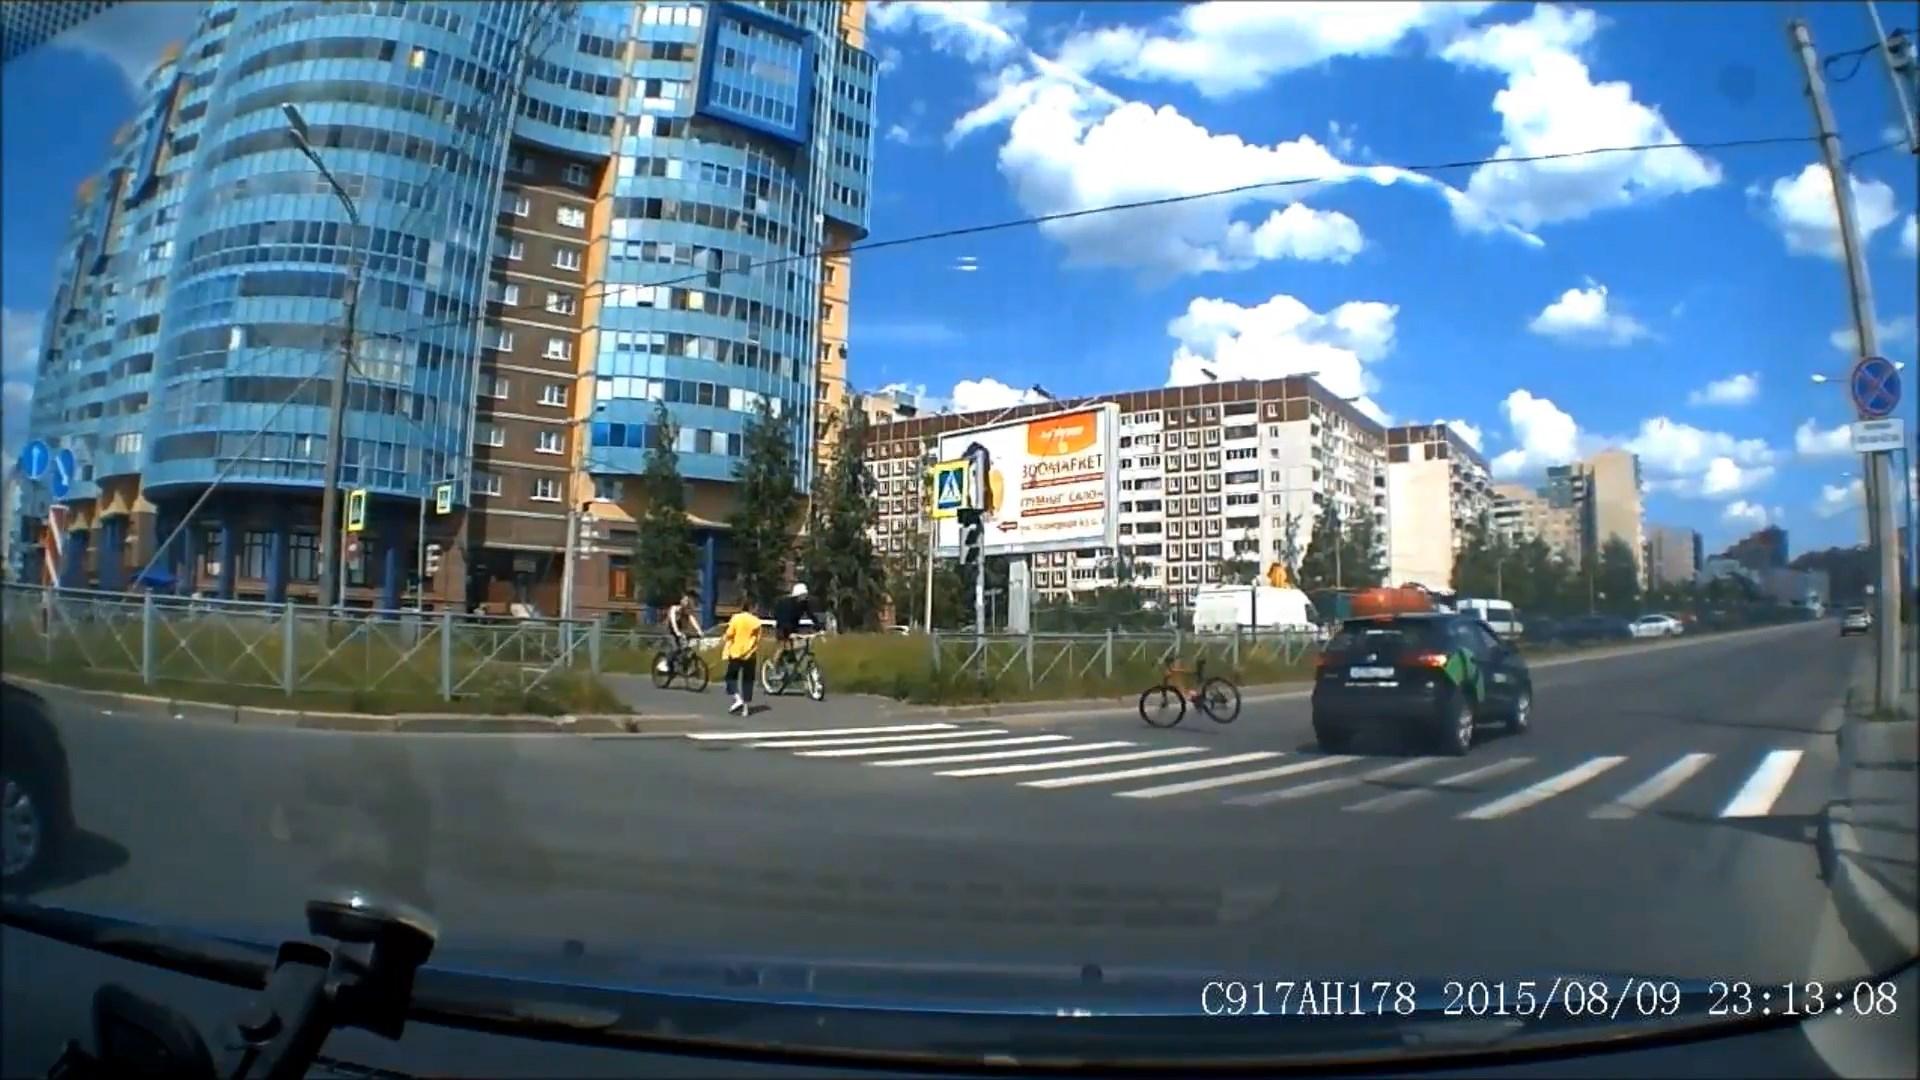 "Скриншот видео из группы <a href=""https://vk.com/wall-68471405_15225518"" class=""io-leave-page _"" target=""_blank"">«ДТП и ЧП | Санкт-Петербург»</a>"